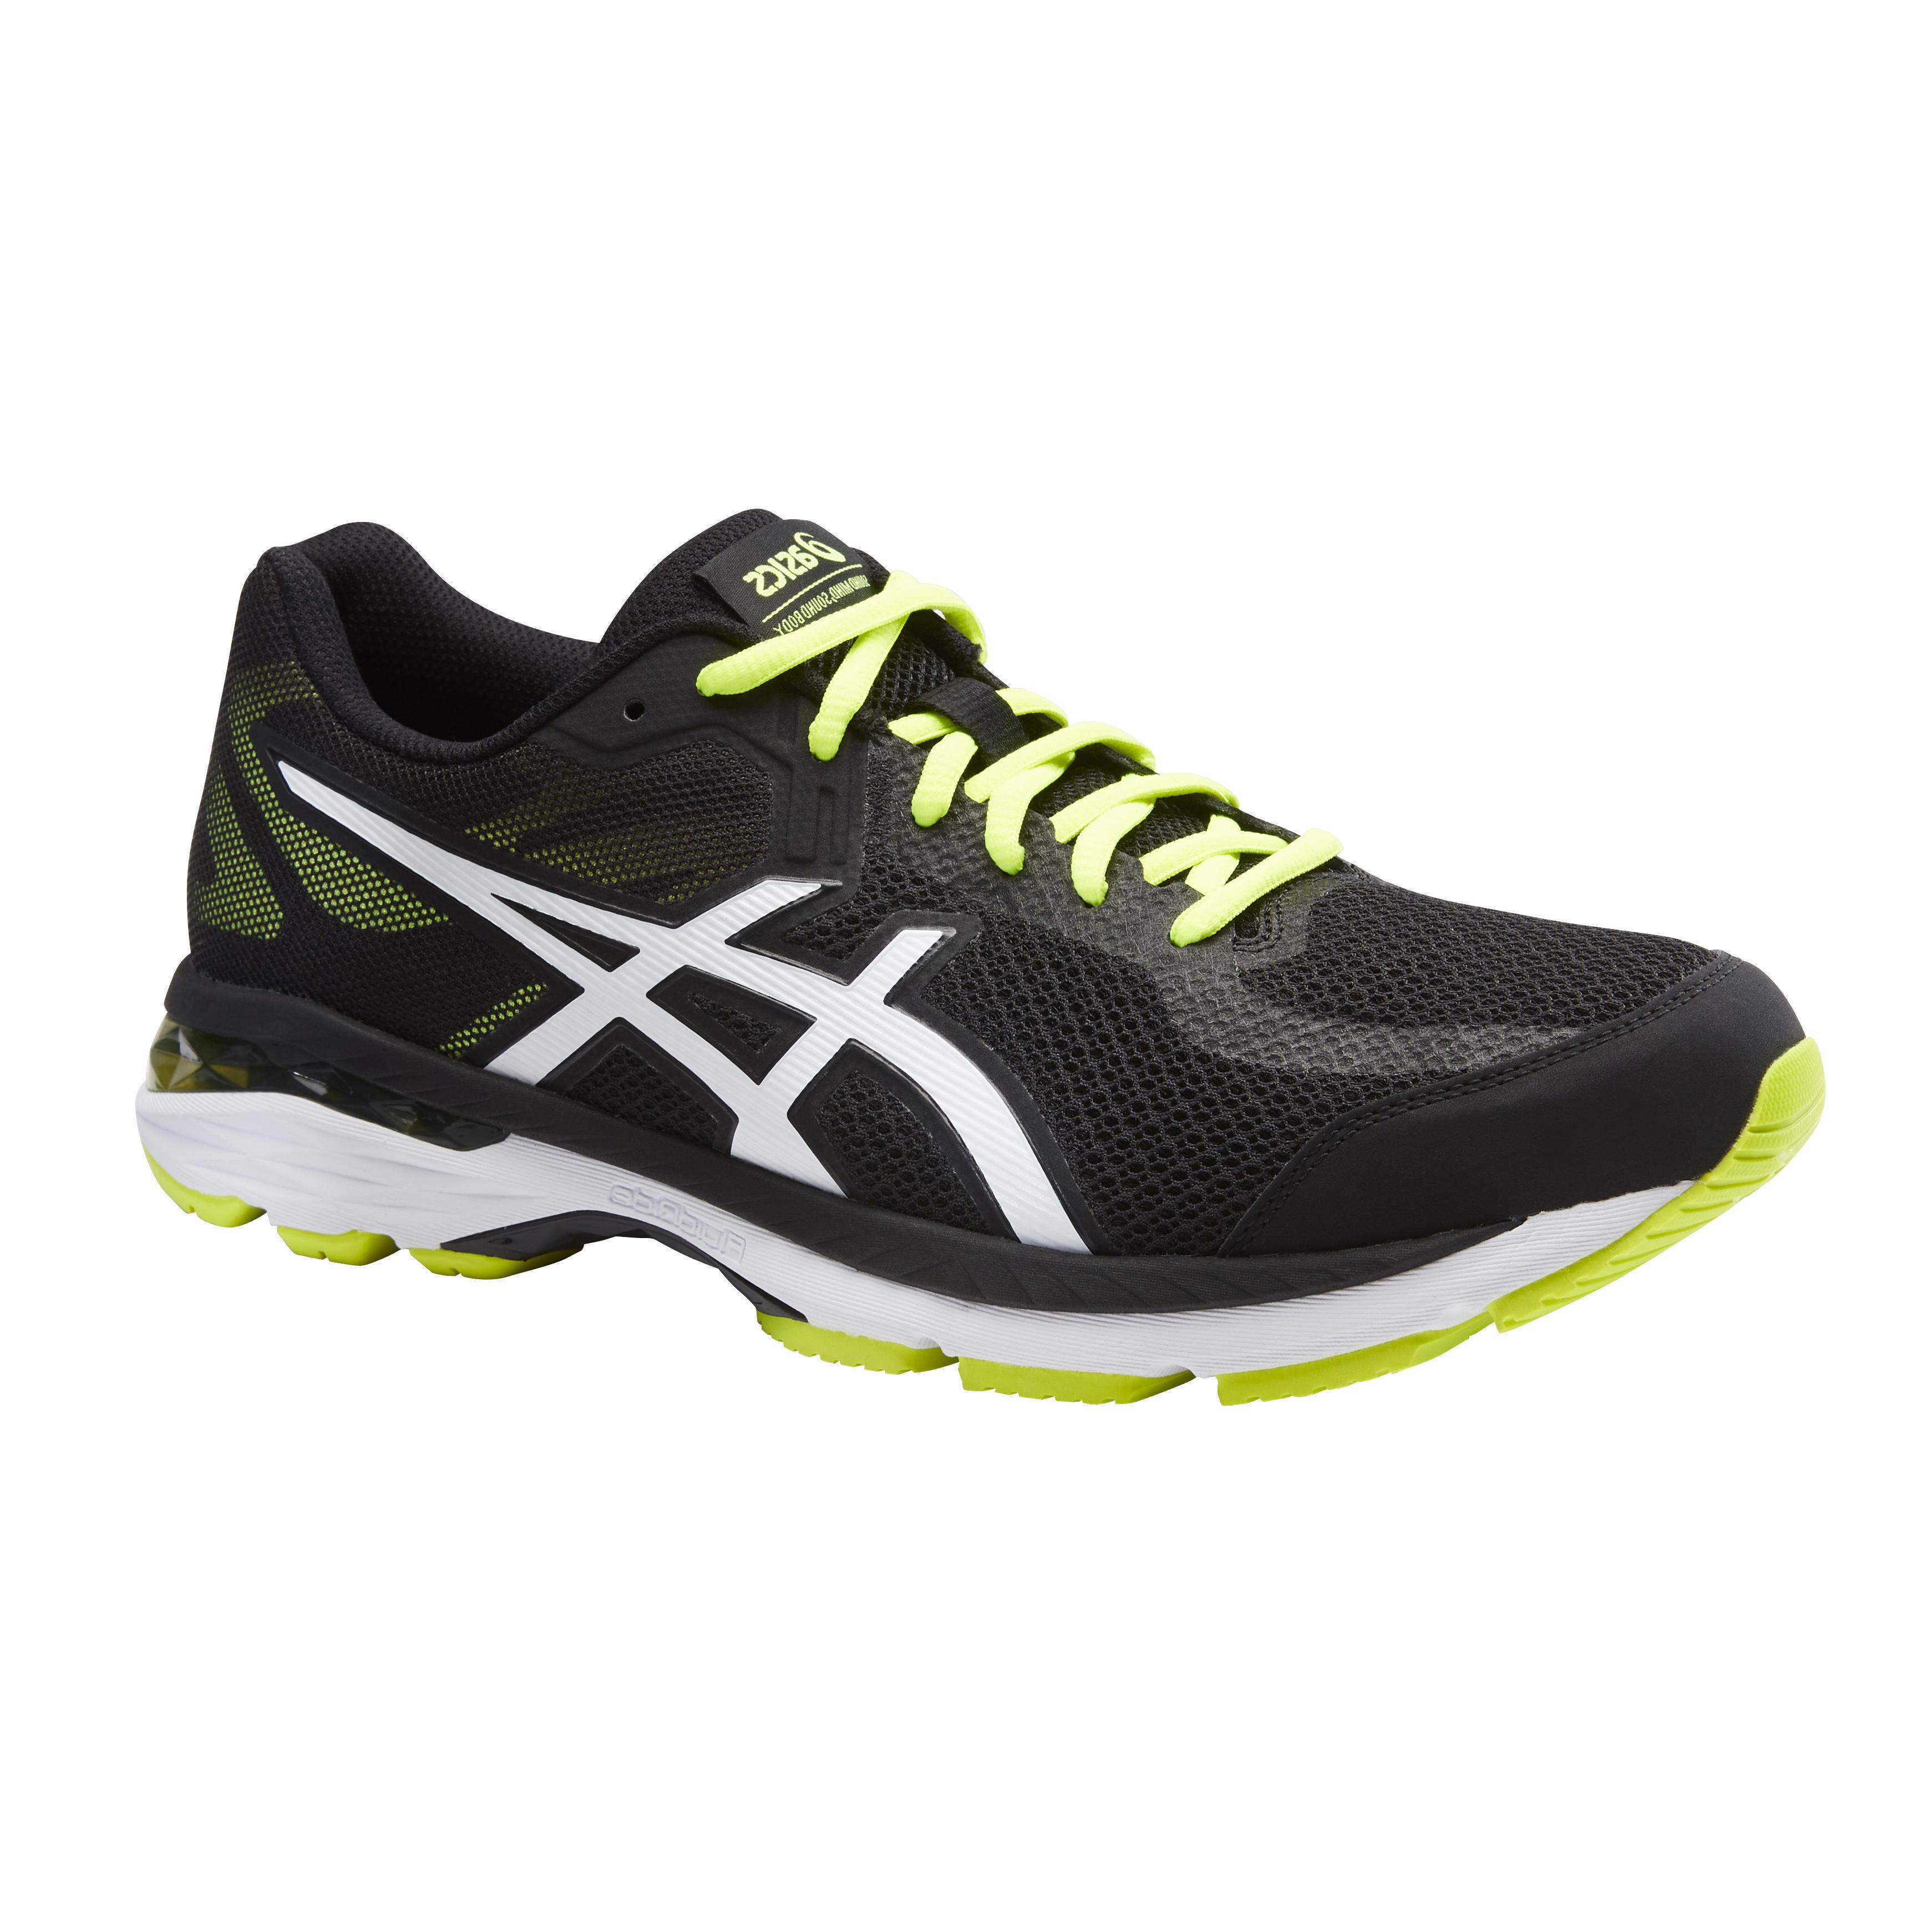 asics running shoes decathlon off 74